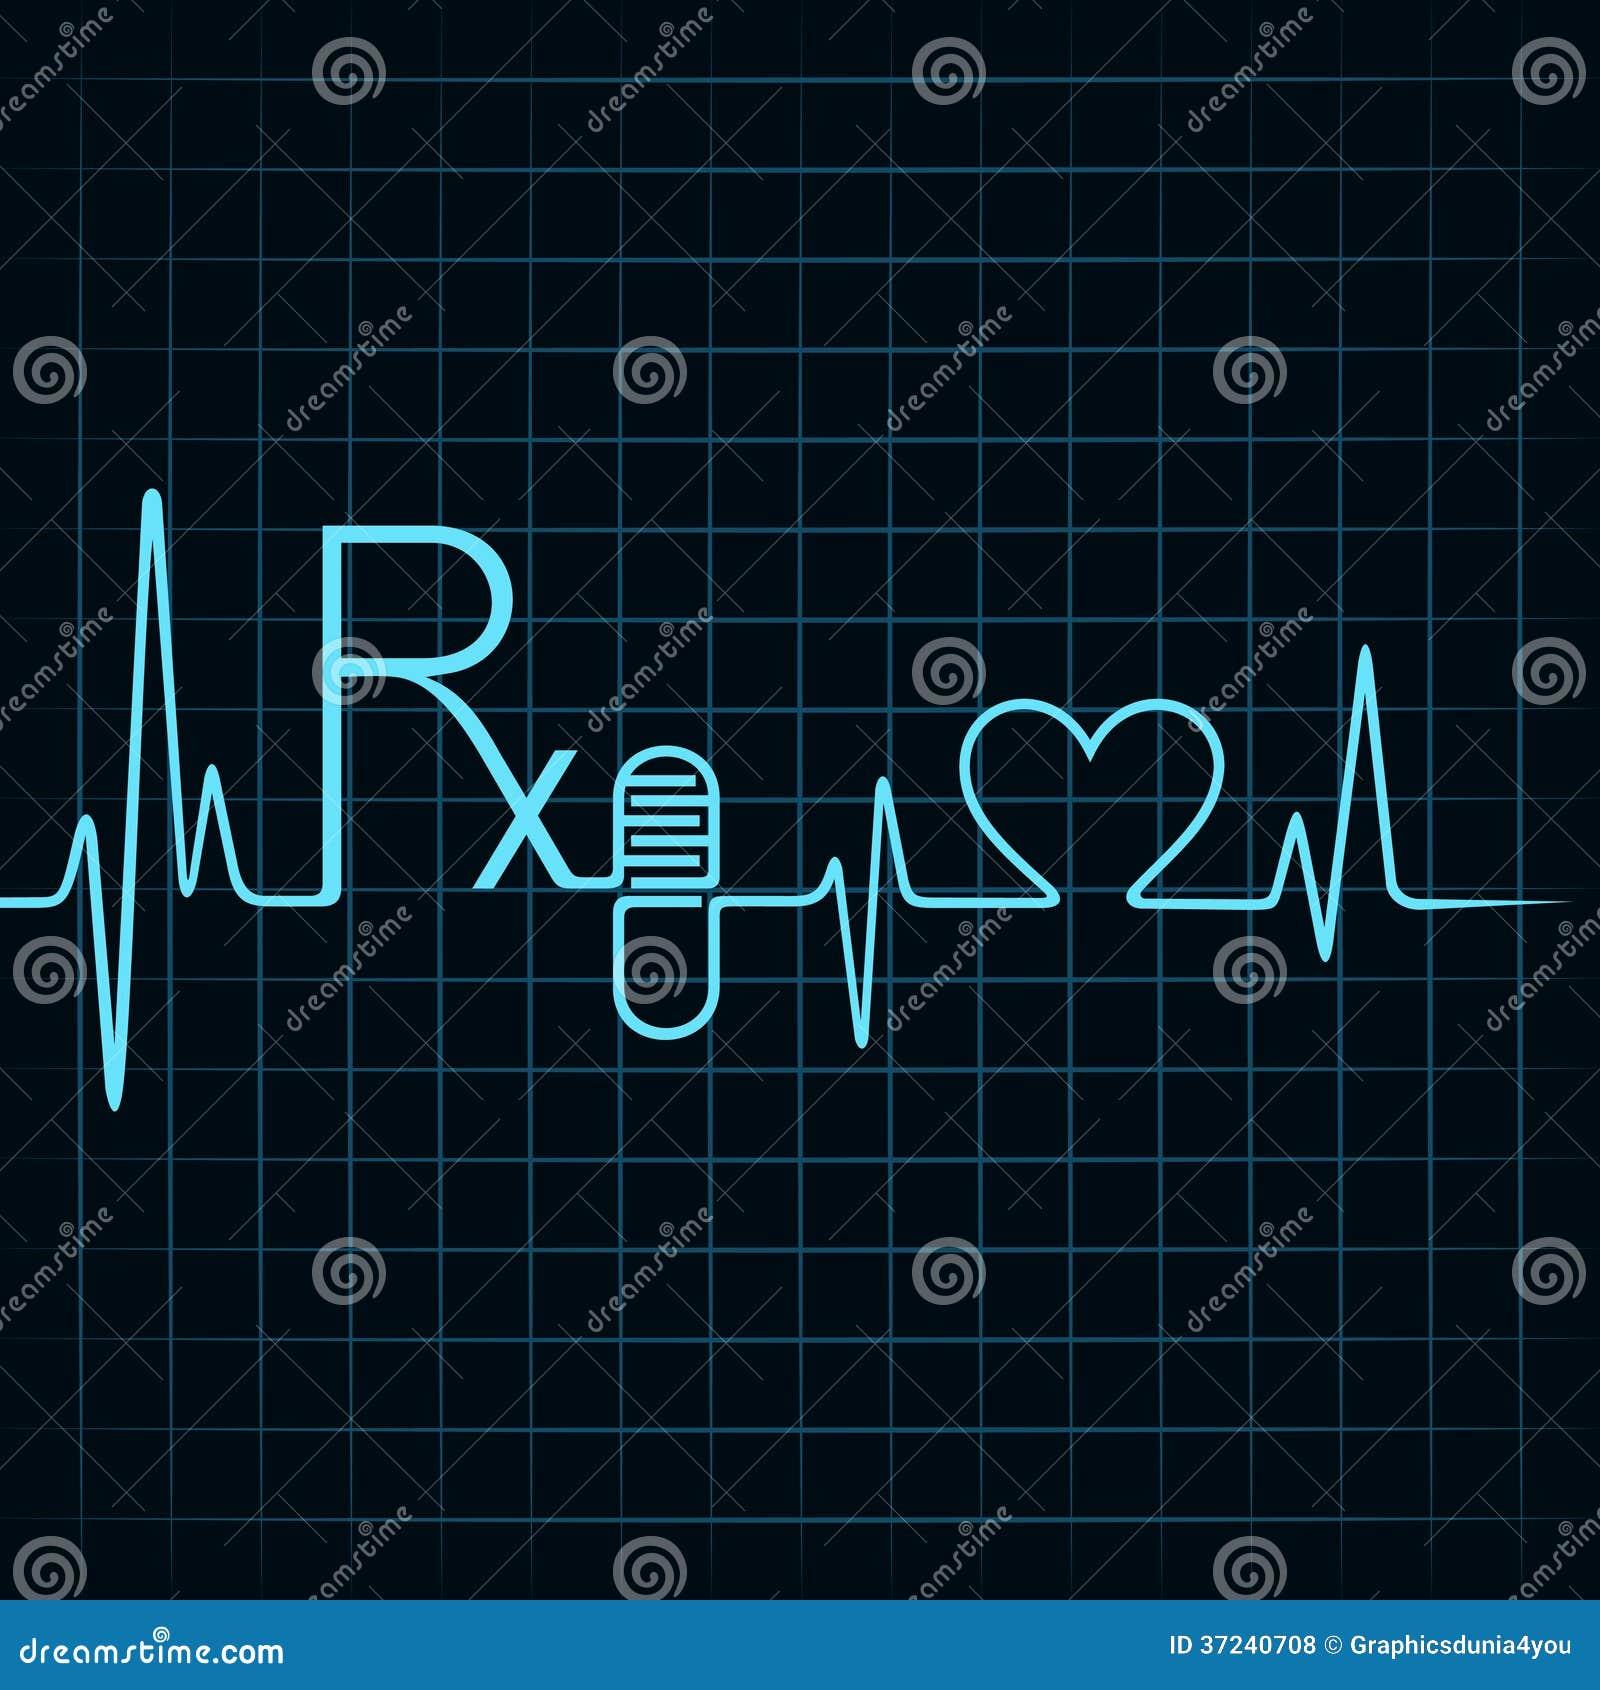 Heartbeat Make Rx Text Capsule Heart Symbol Stock Vector Rhythm Illustrations Royalty Free